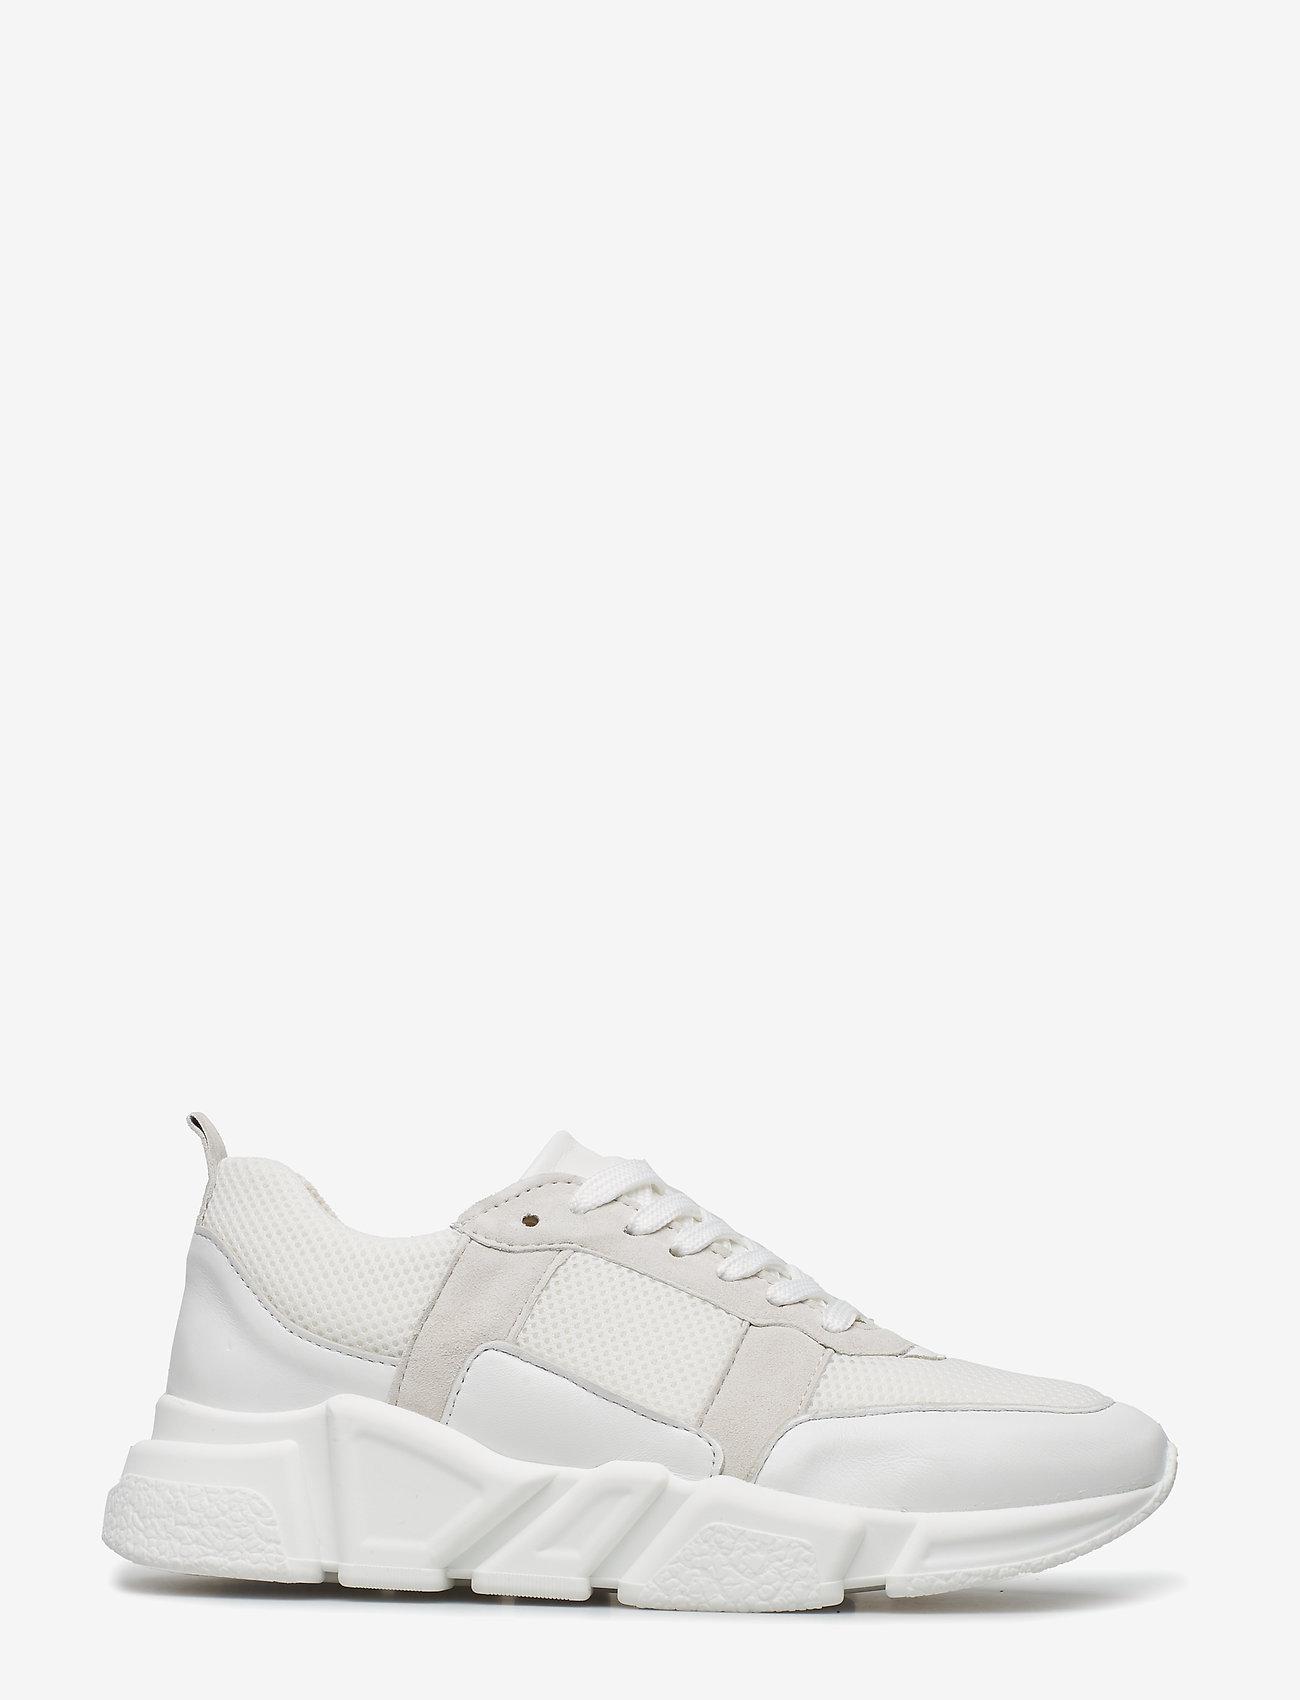 Billi Bi - SHOES 8853 - chunky sneakers - white comb. 793 - 1